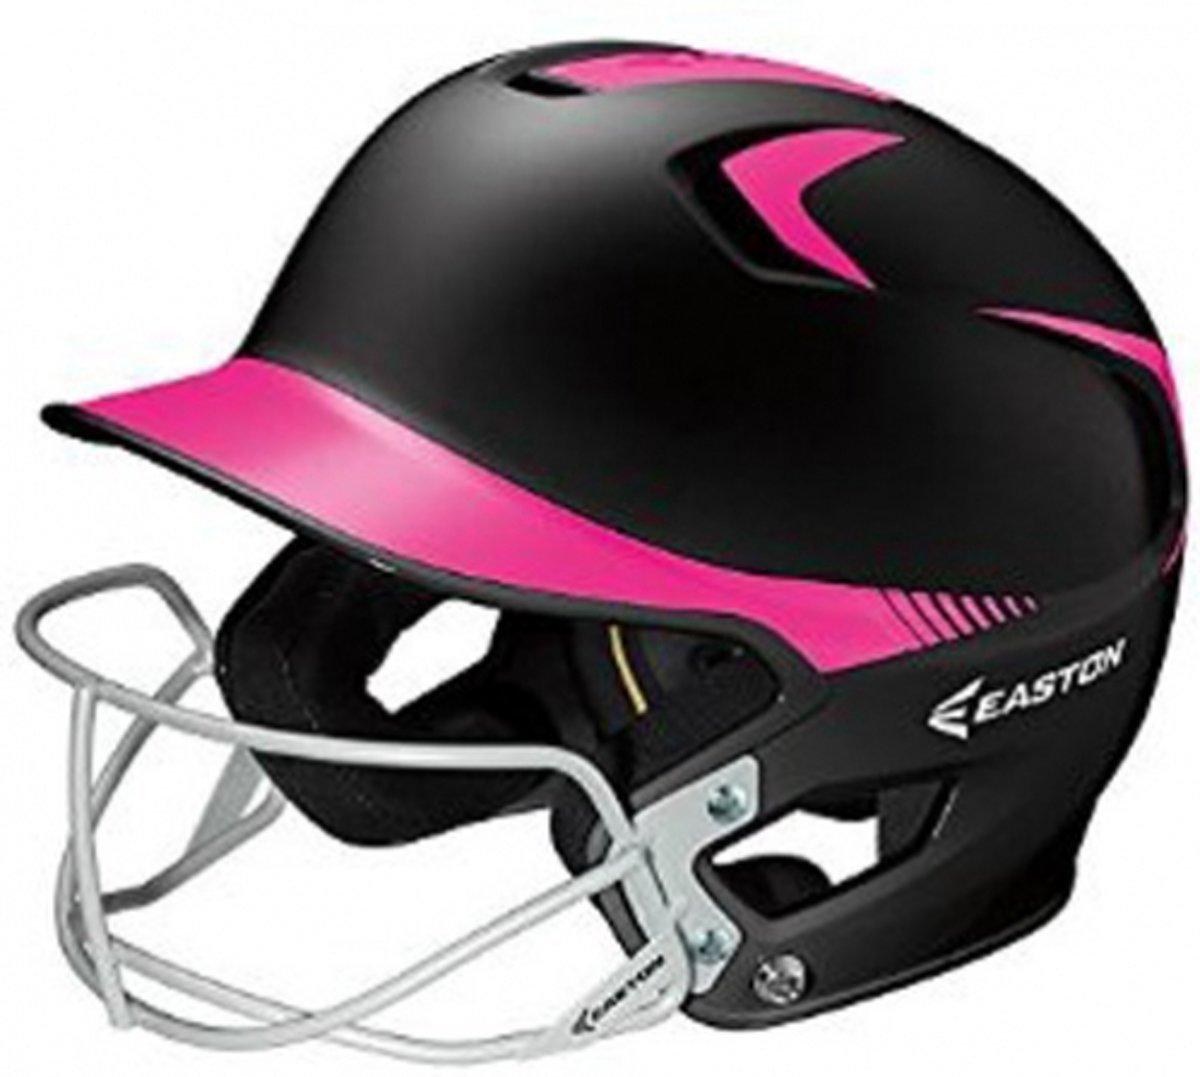 Easton Z5 Softbal Slaghelm 2-Tone + Faceguard Zwart/Roze Junior